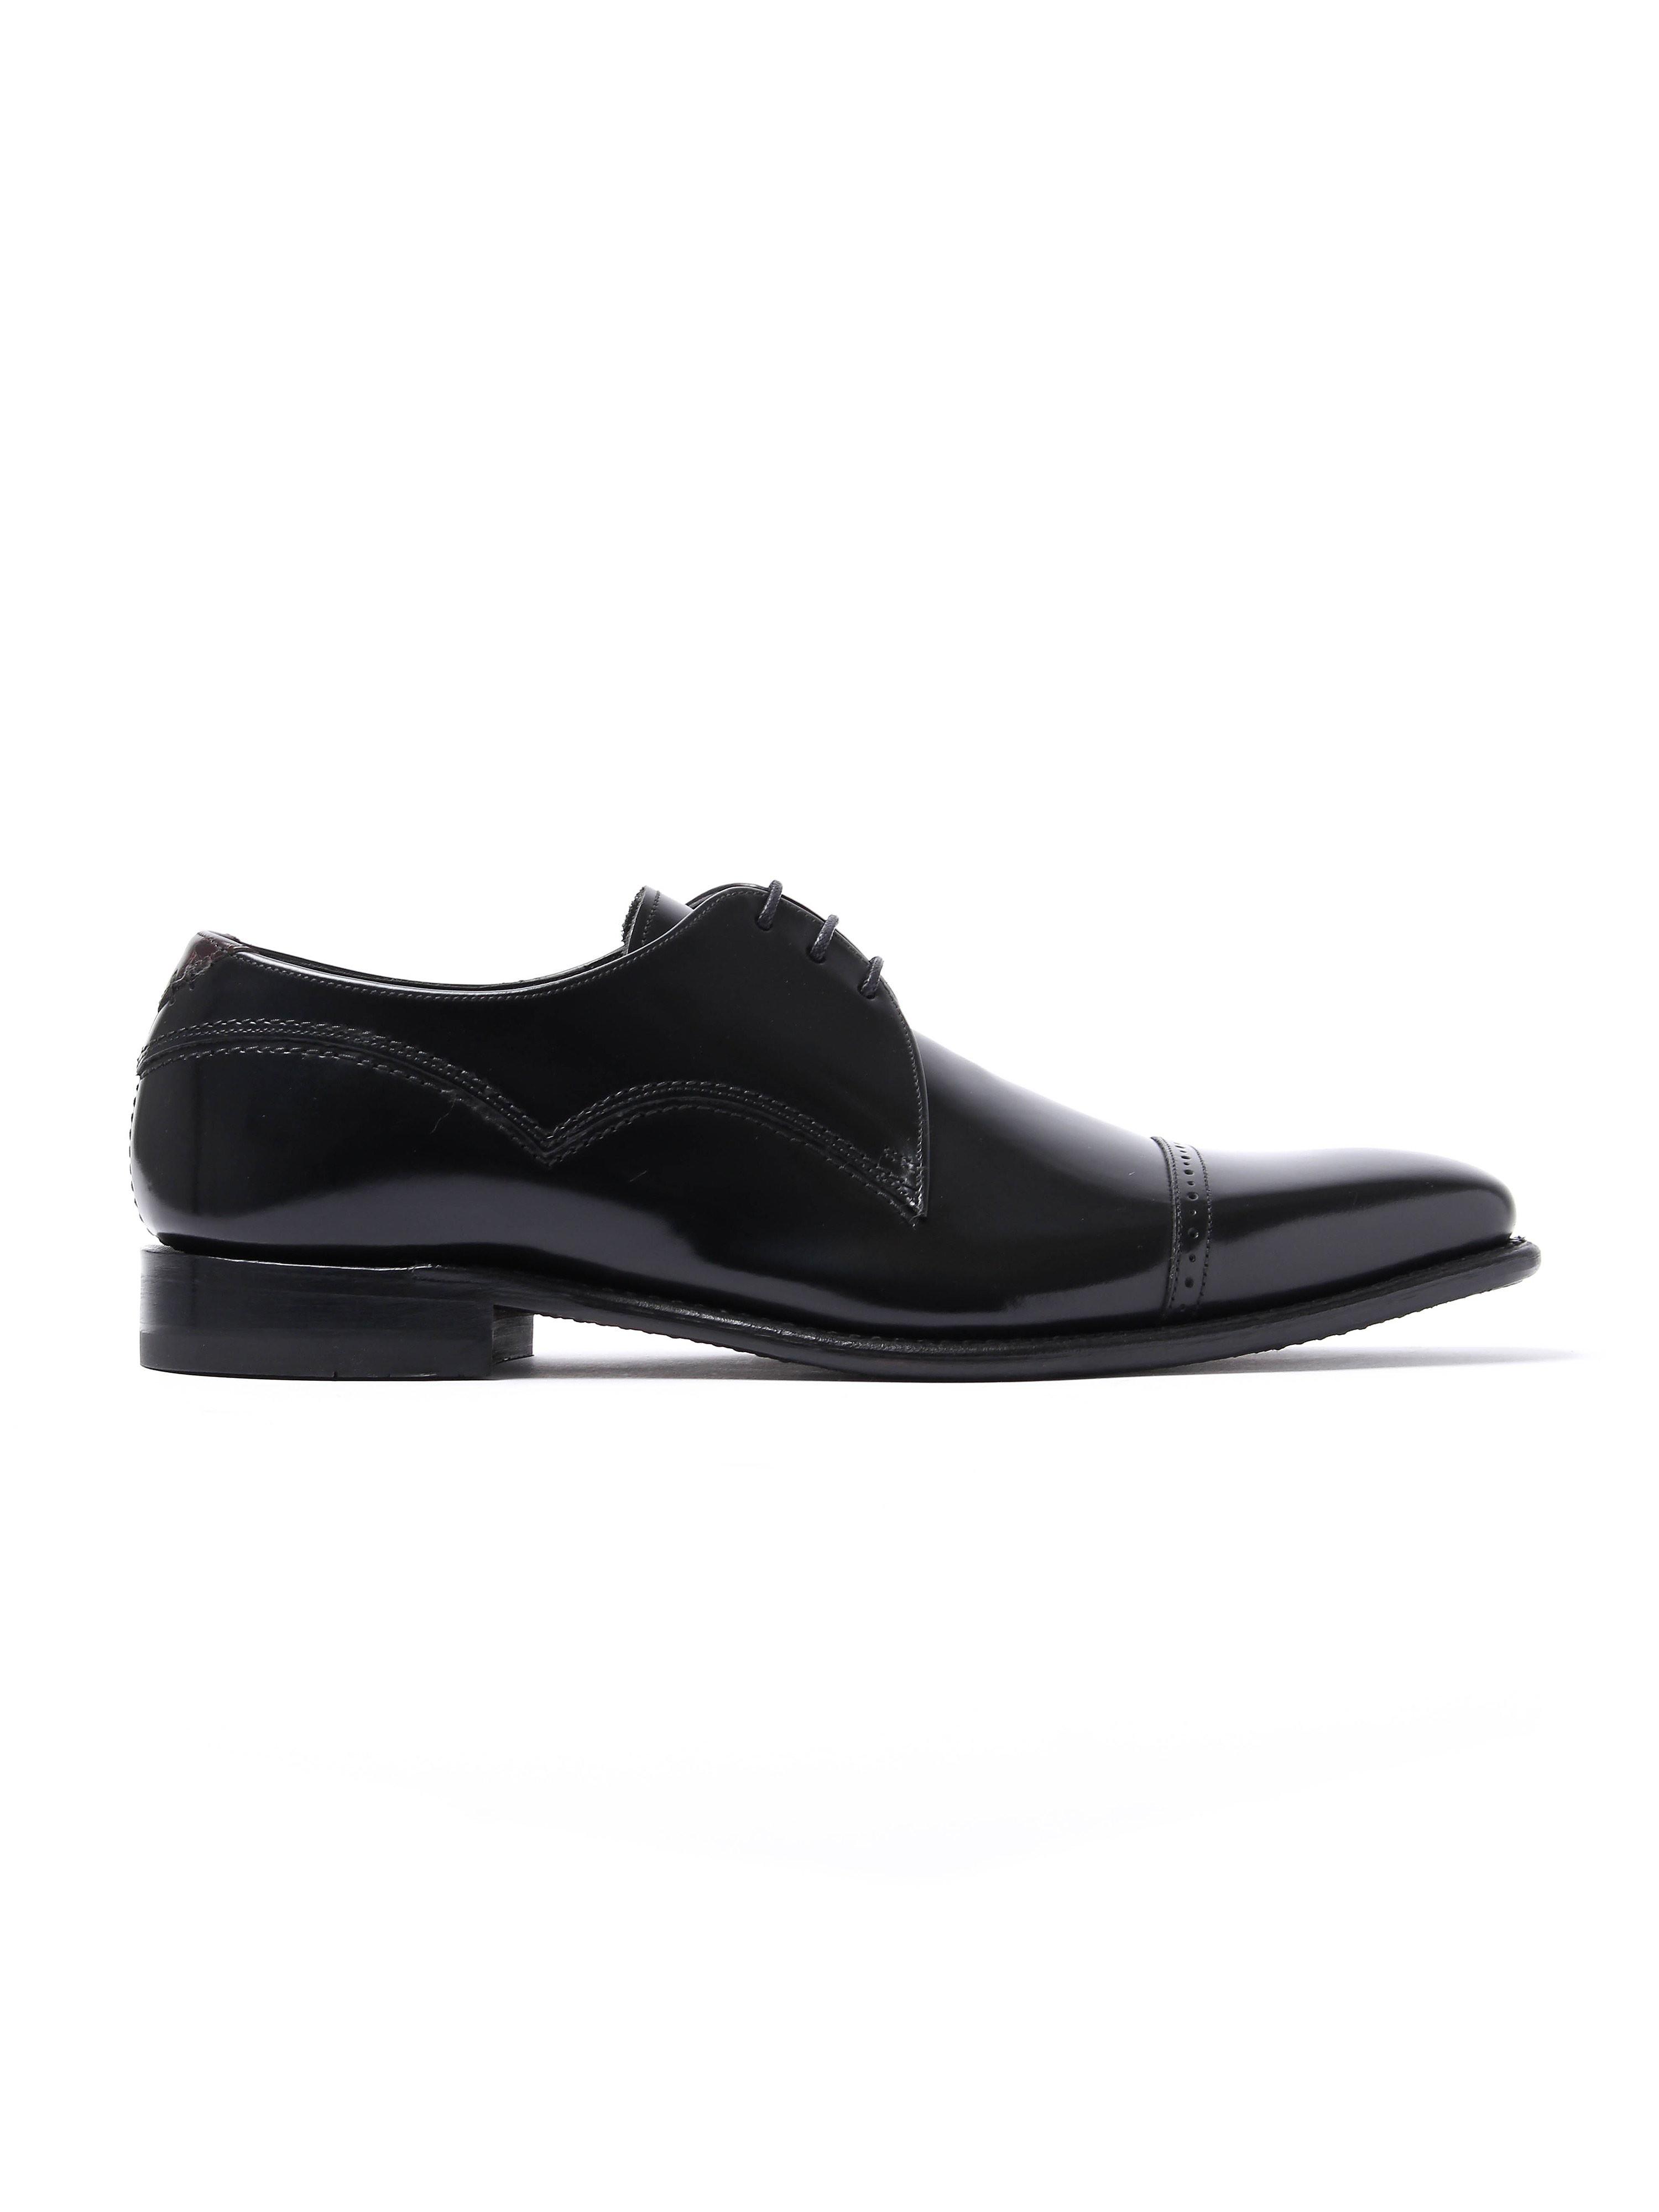 Barker Men's Carlson Patent Leather Cap-Toe Derby Shoes - Black